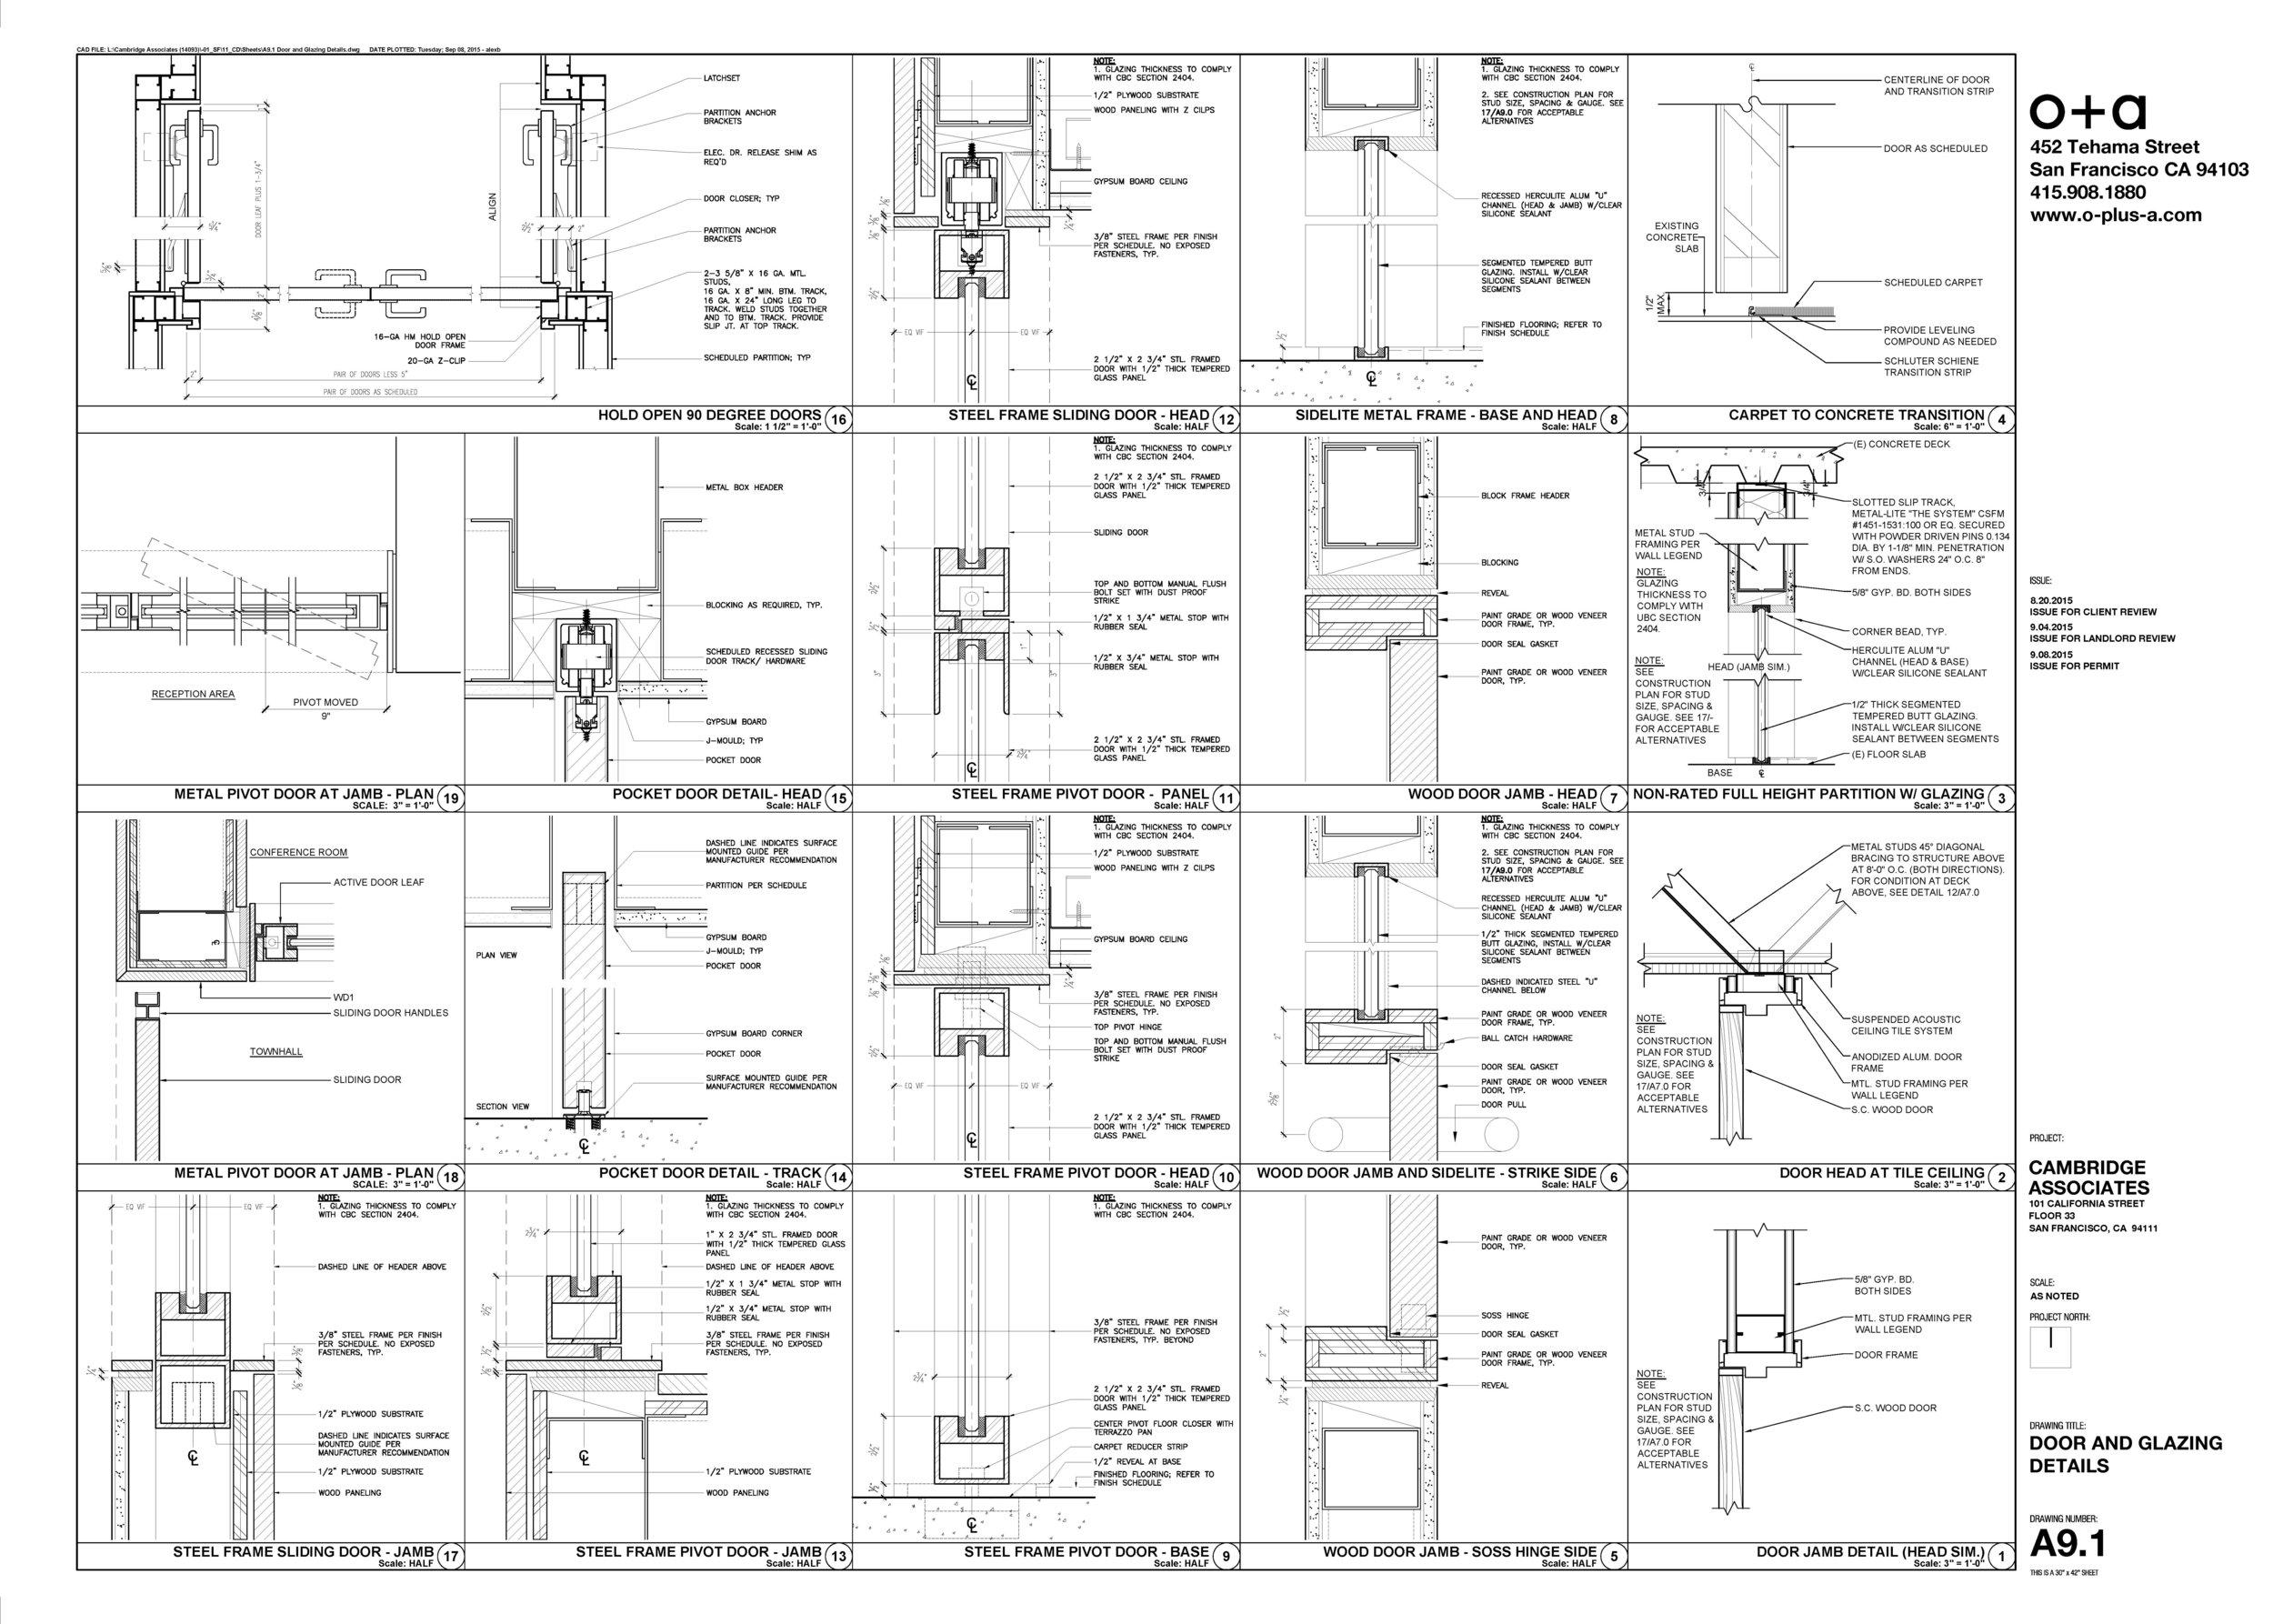 15-0908_CambridgeAssociates_SF_Permit Set_Page_18.jpg